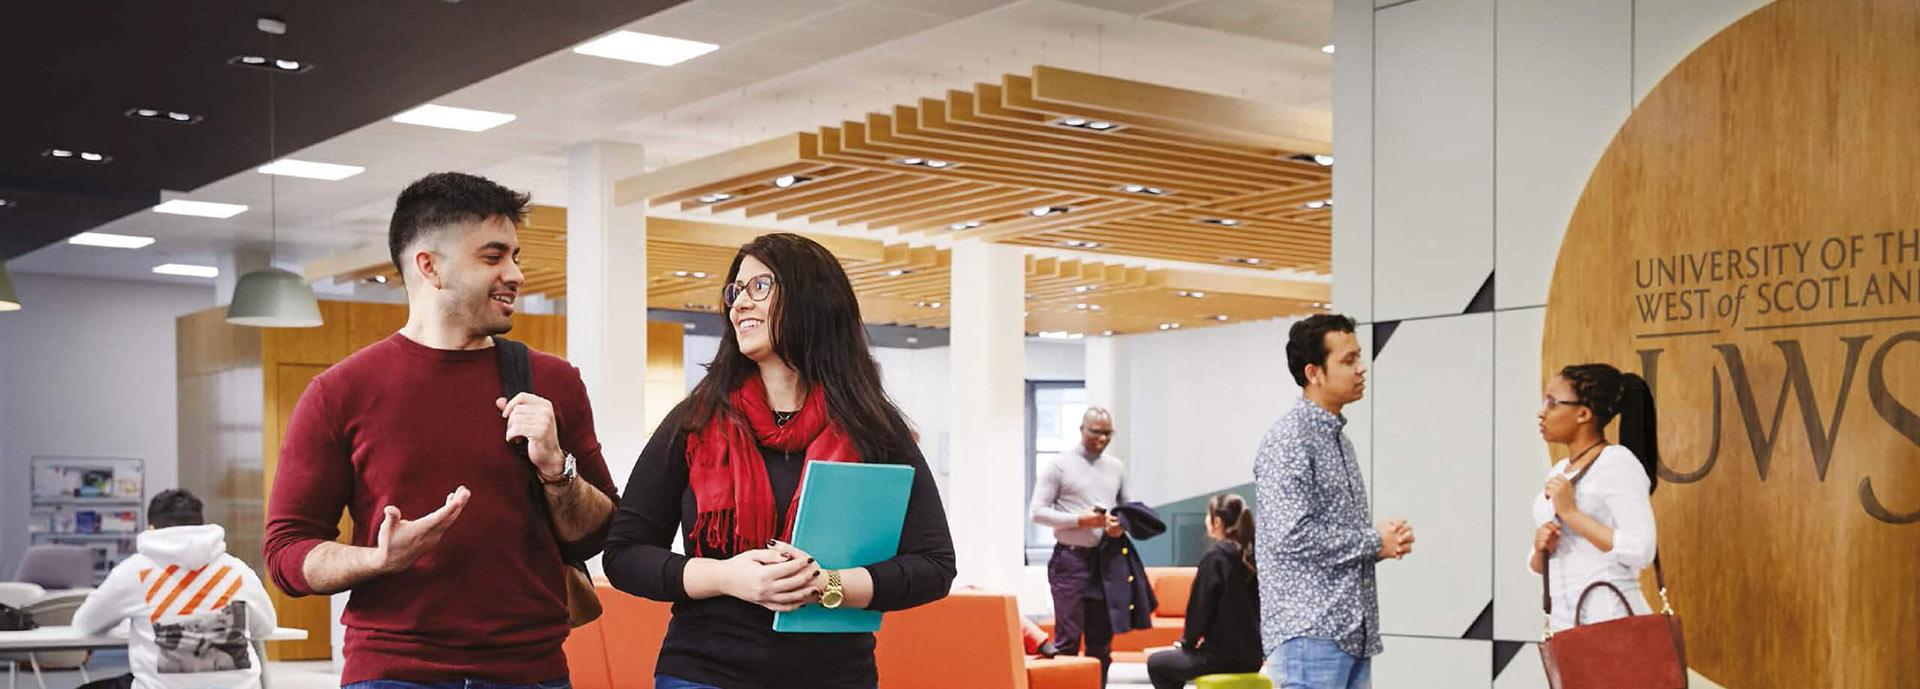 University of the West of Scotland World University Rankings